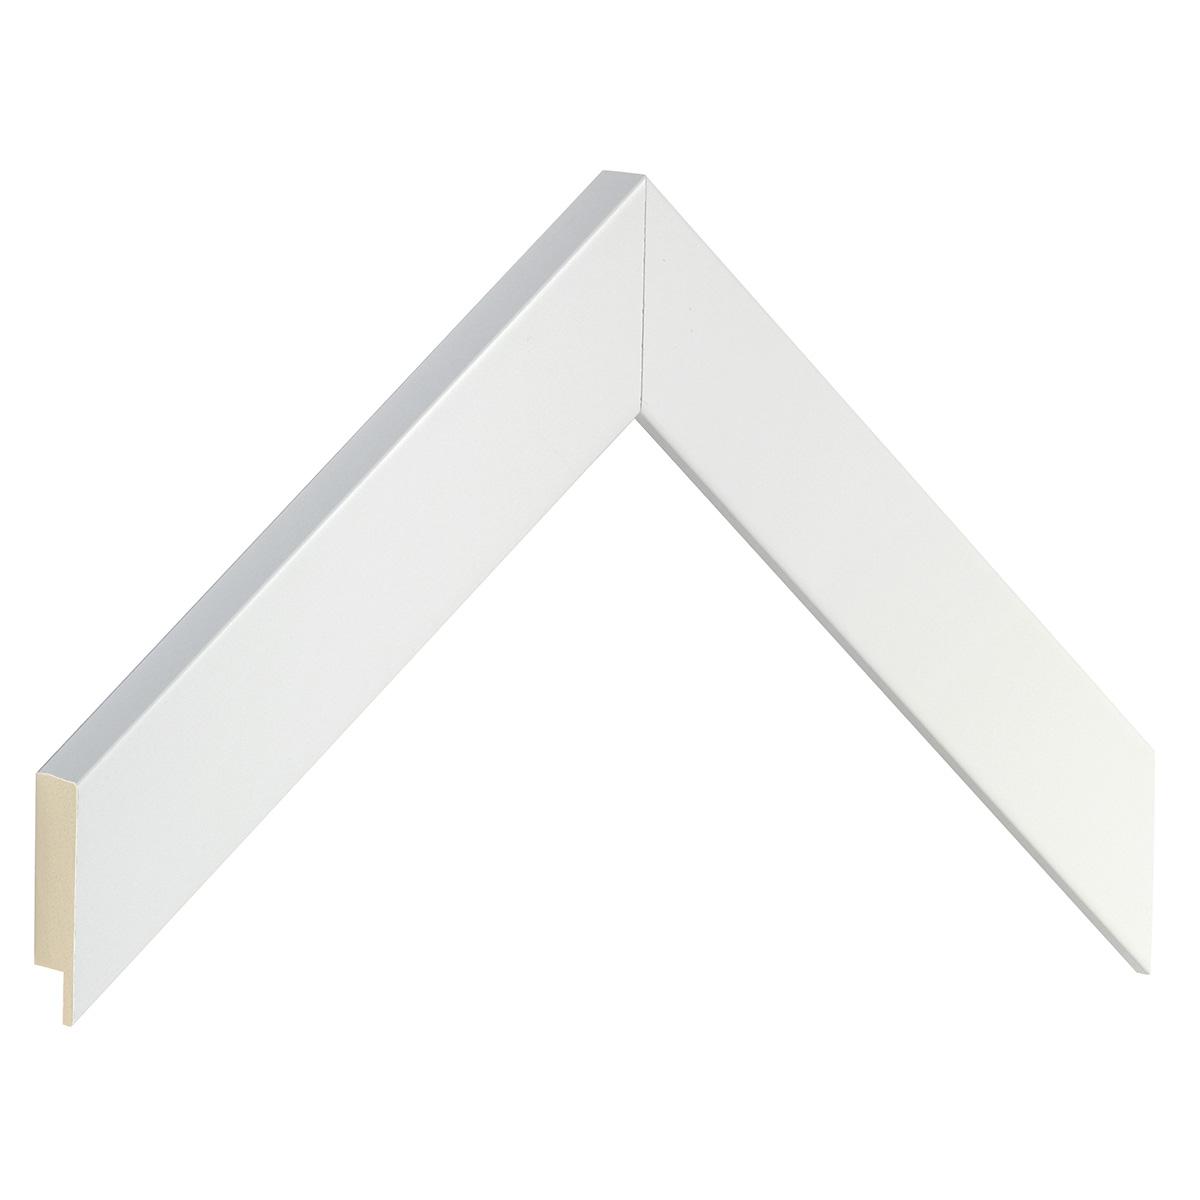 Moulding ayous, width 30mm height 20 - White, matt